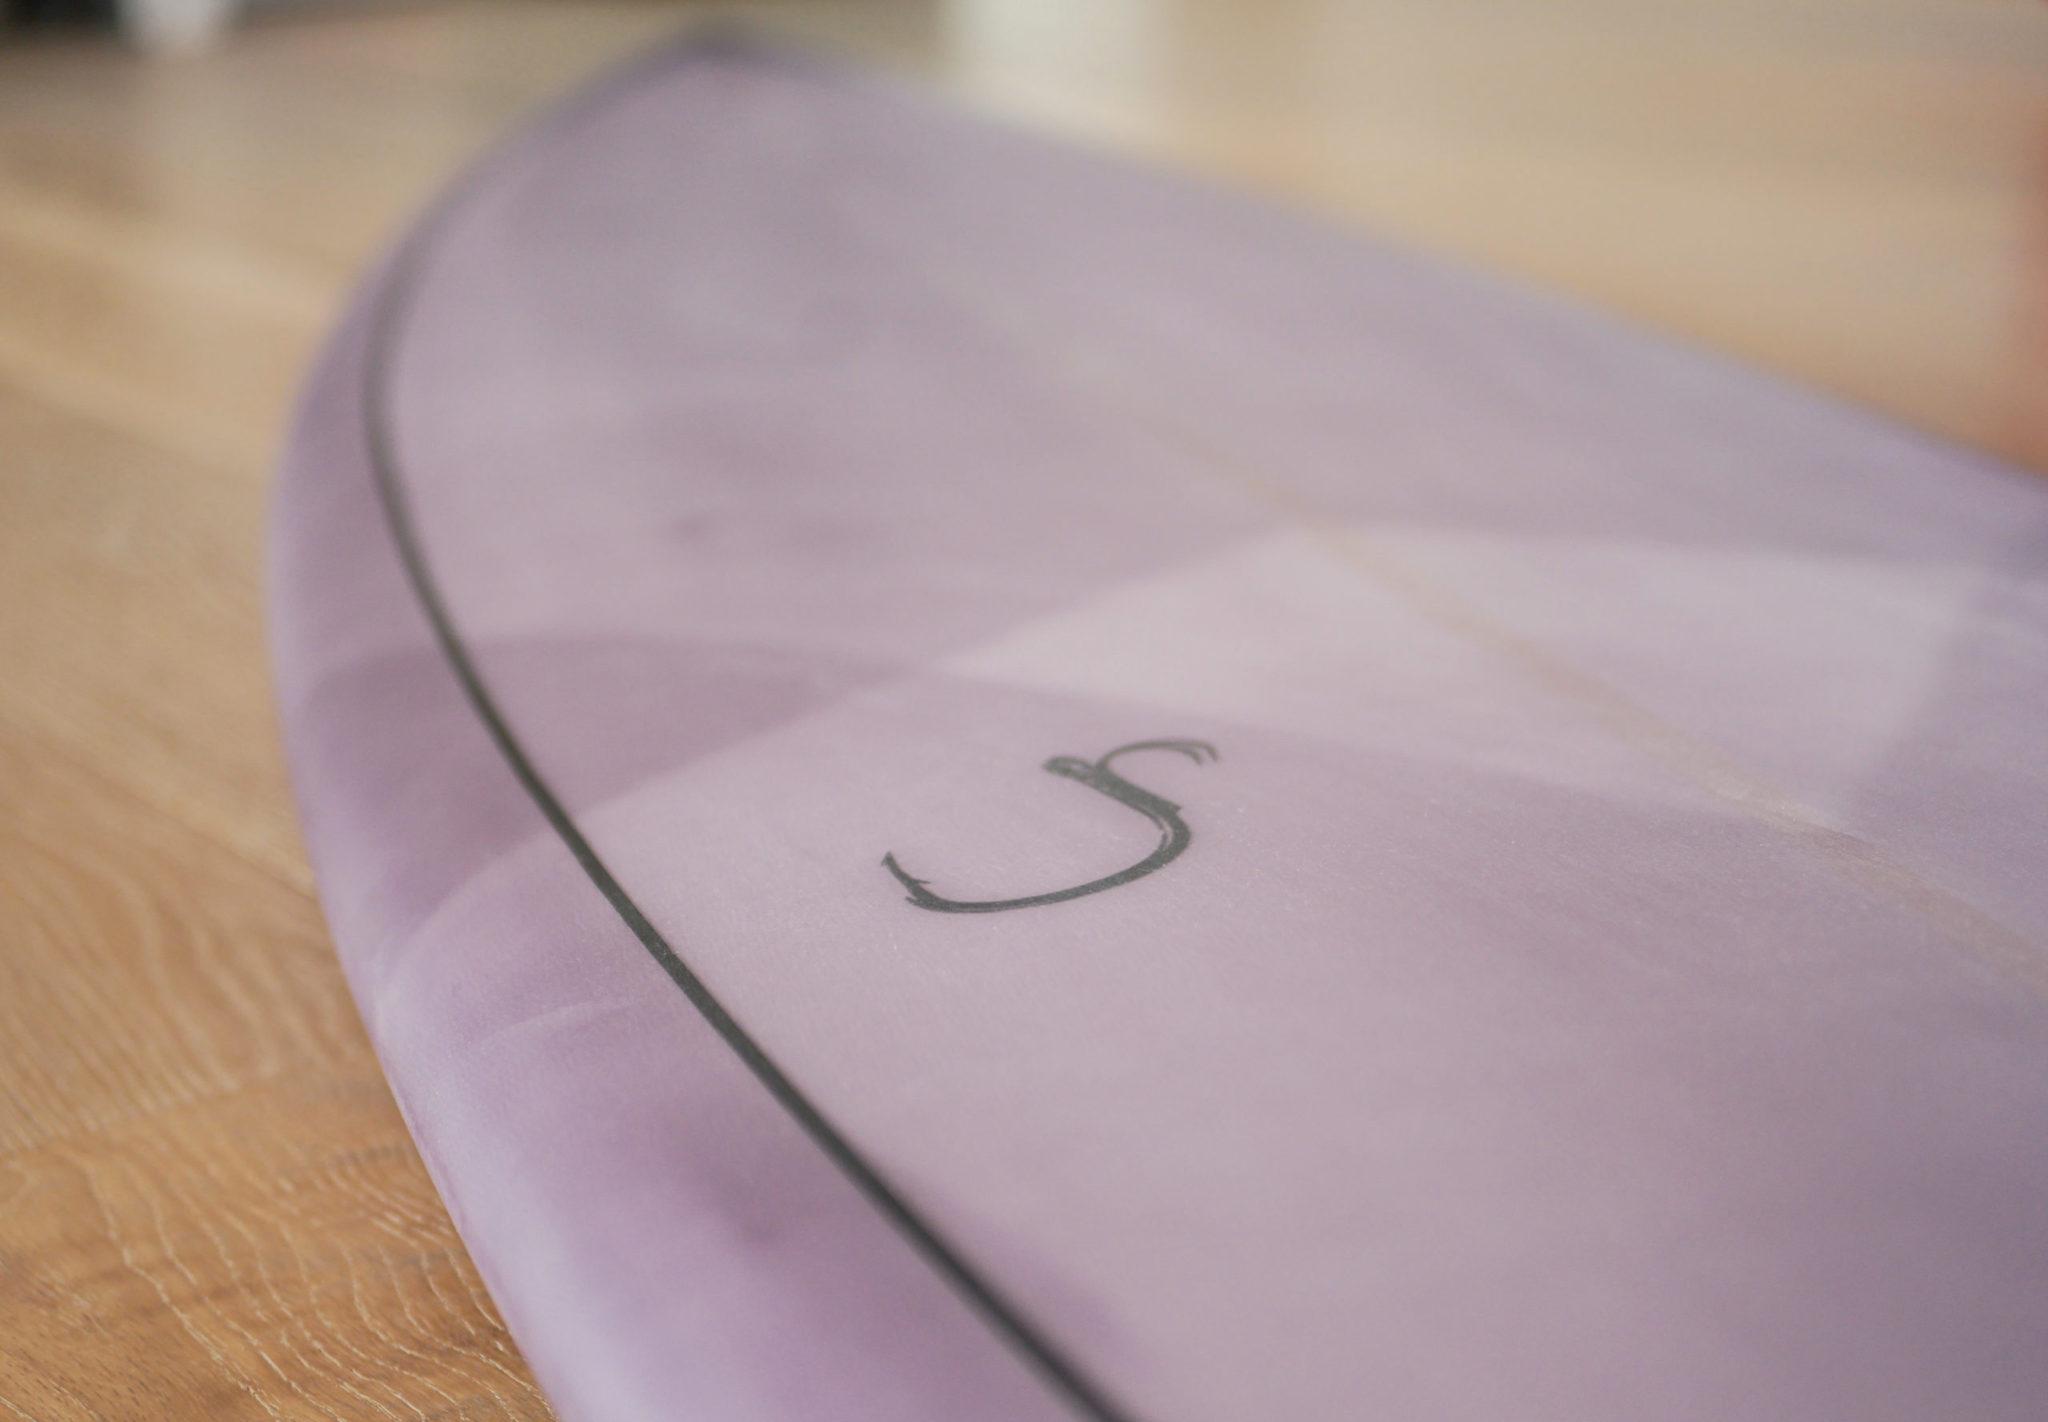 Cachalot Surfboards planche surf handmade artisan shaper hollow wooden bonzer